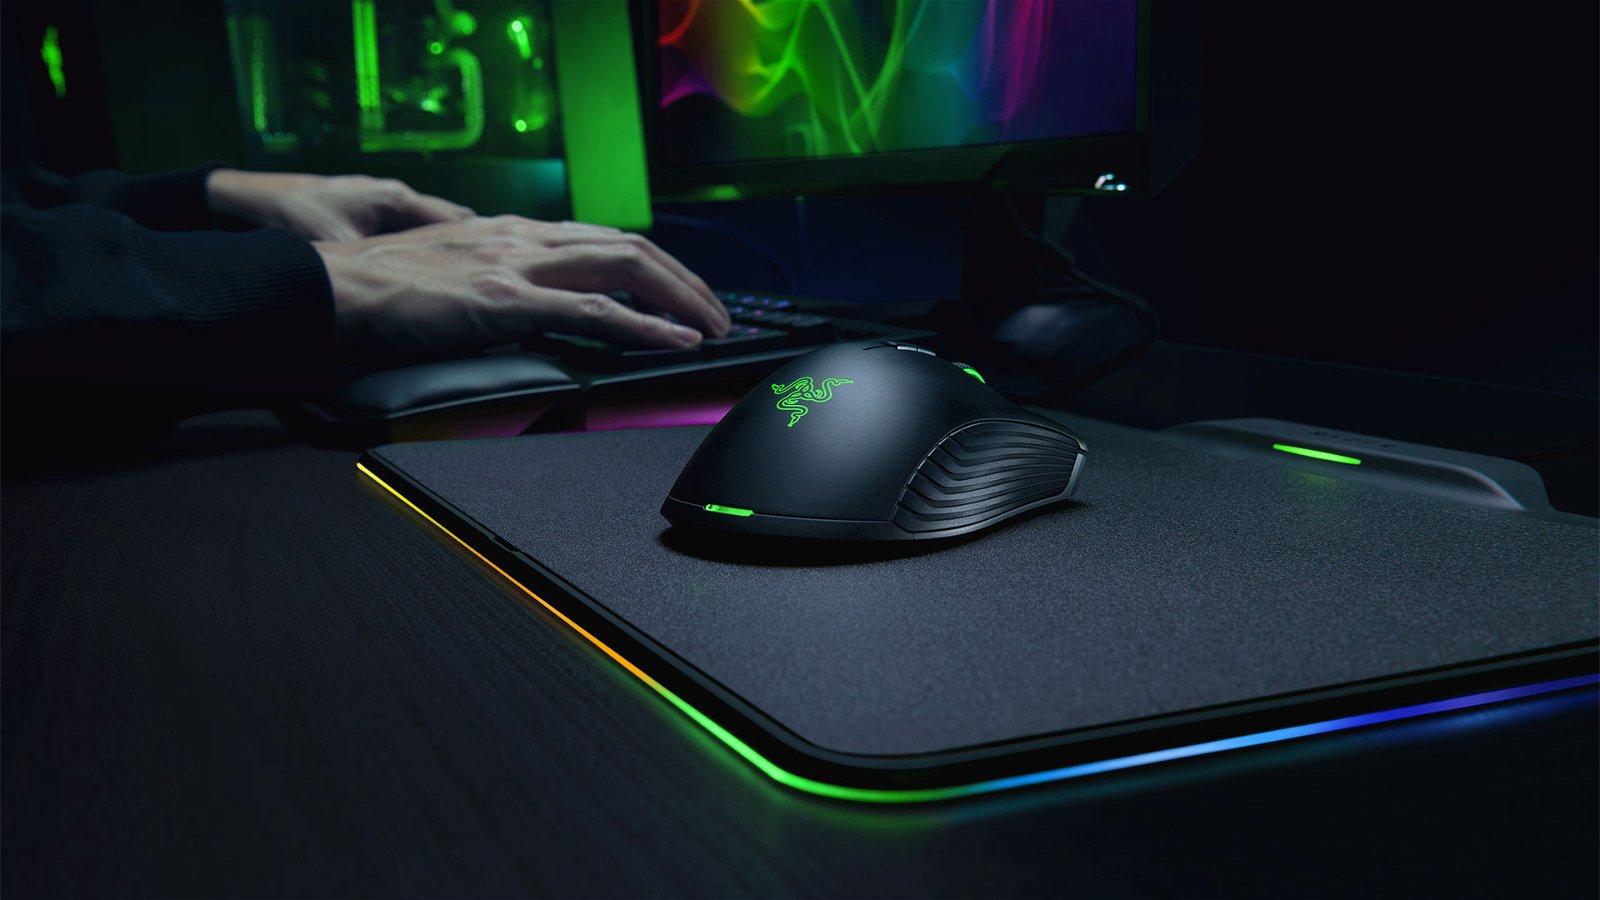 Razer Announce Razer Mamba HyperFlux Wireless Mouse and Pad